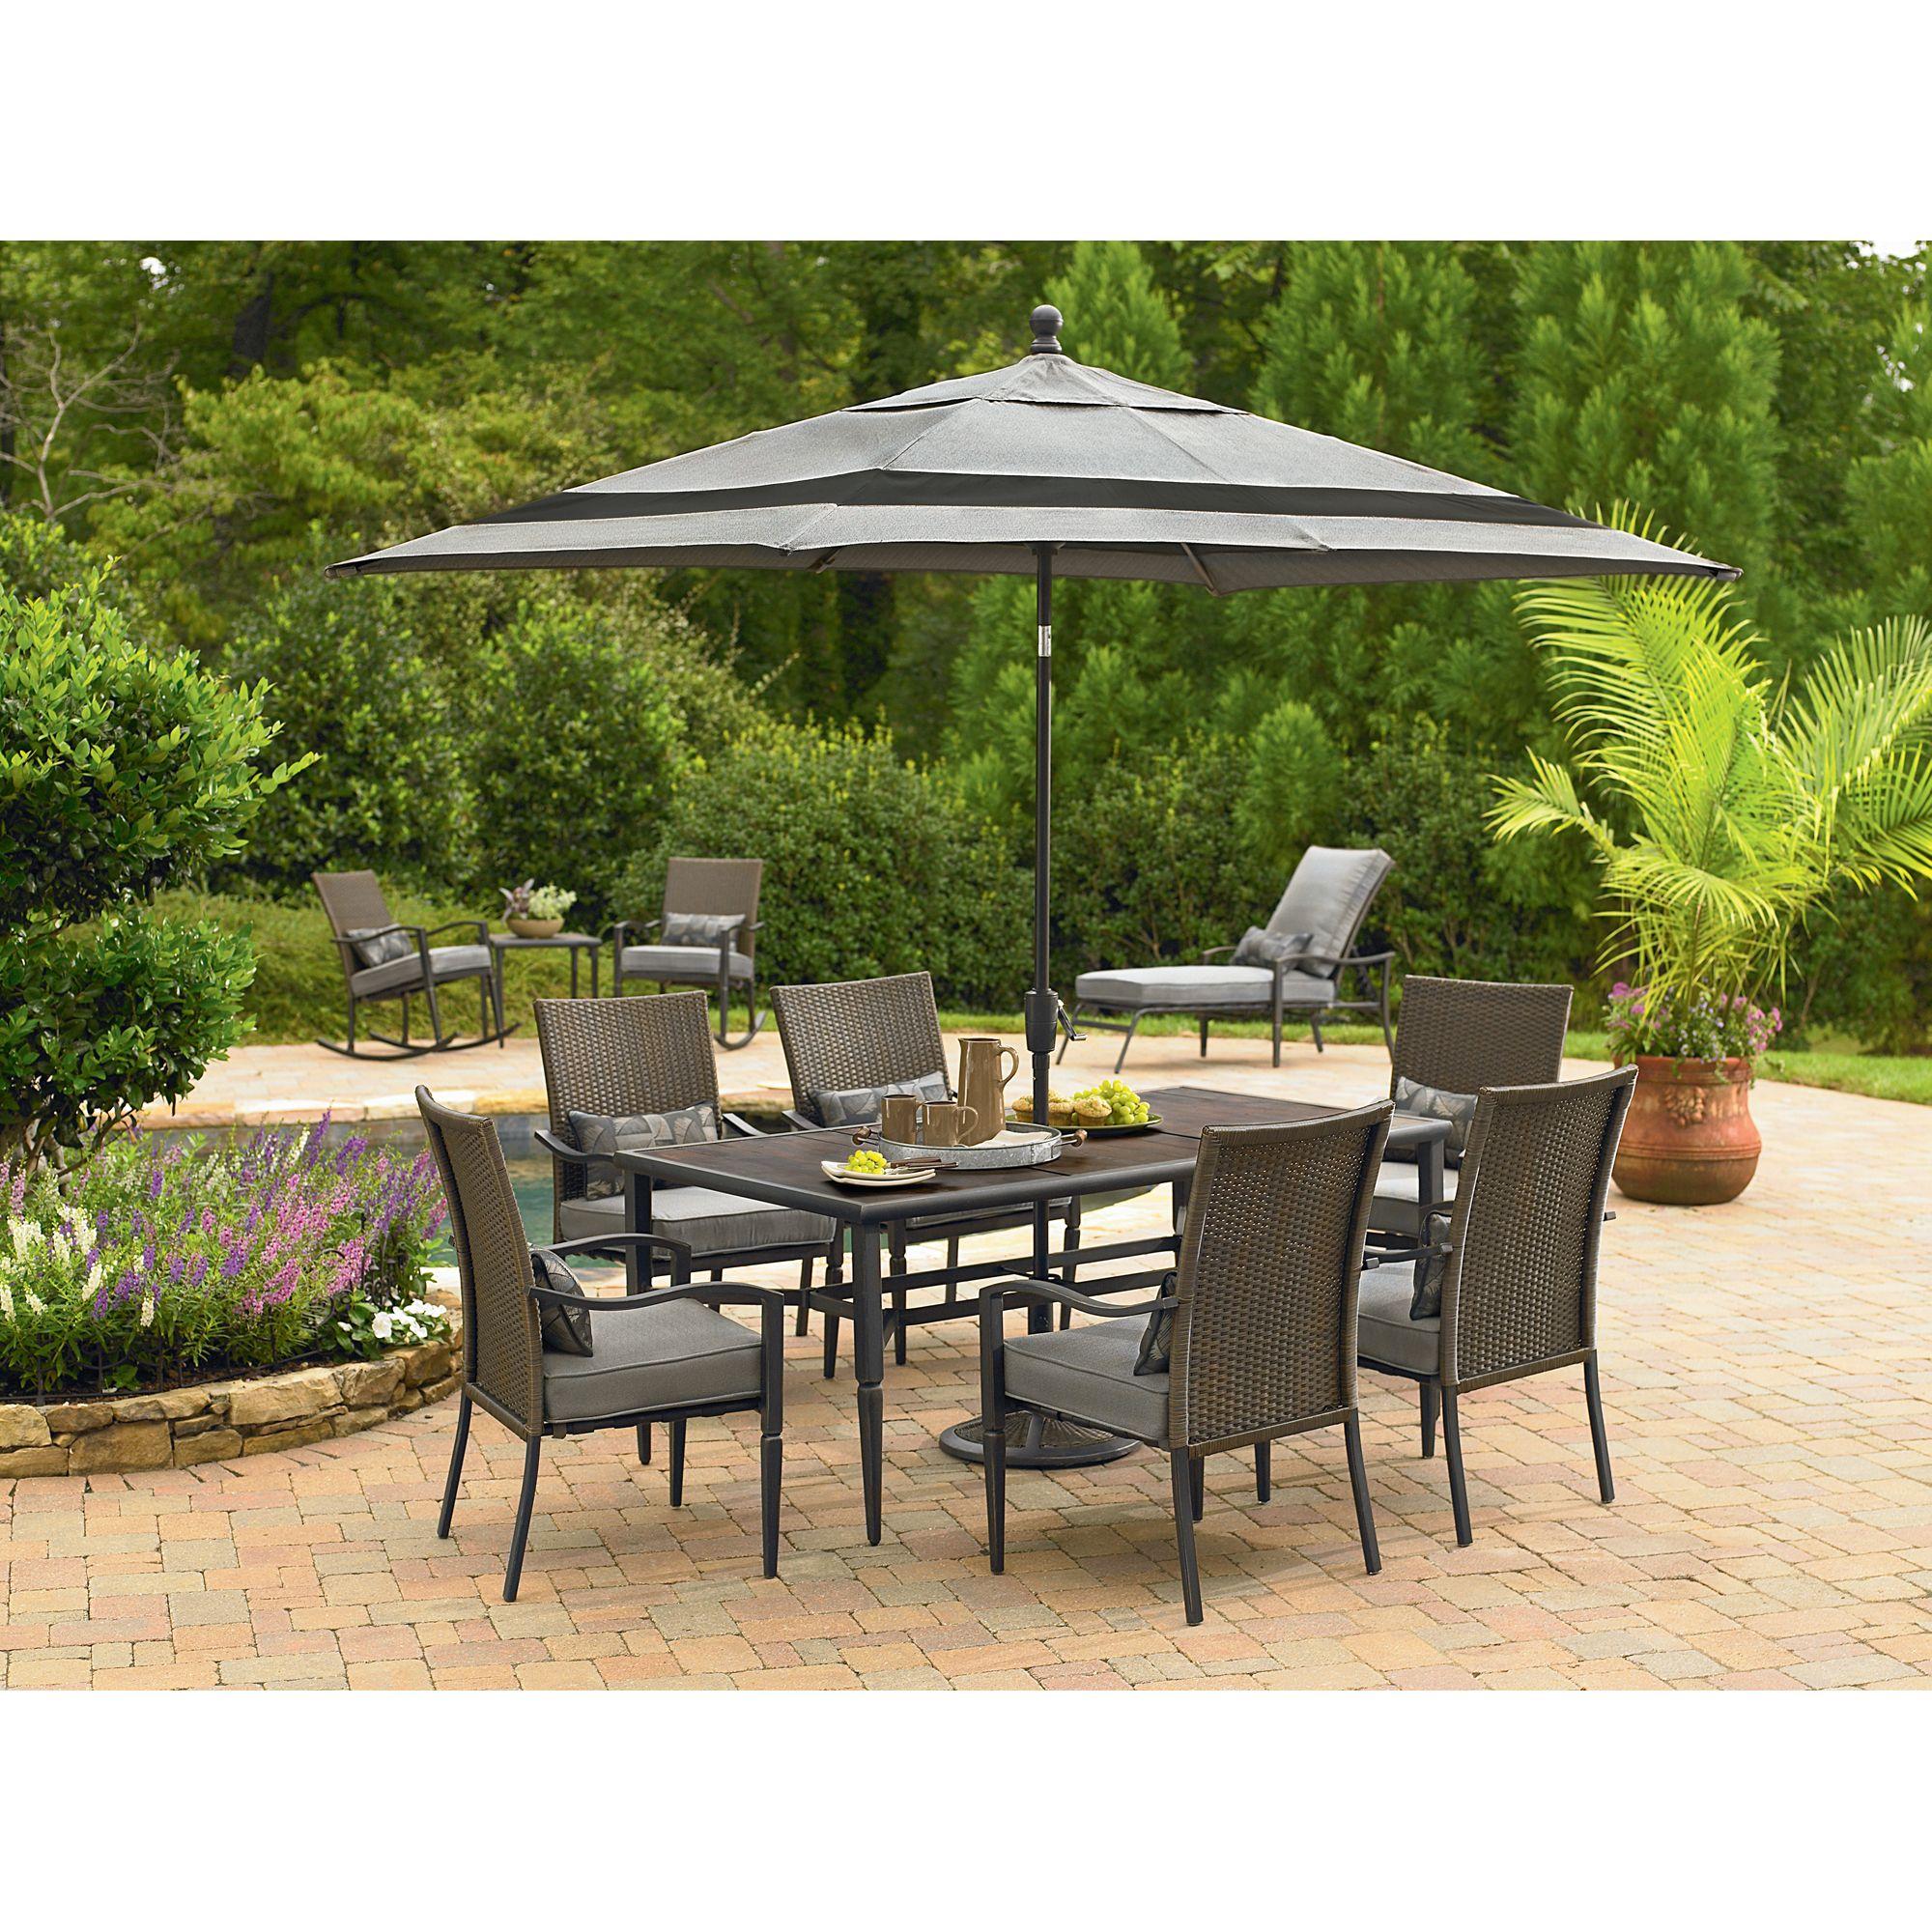 sears patio furniture dining sets Patio Dining Sets Sears Inspiration - pixelmari.com